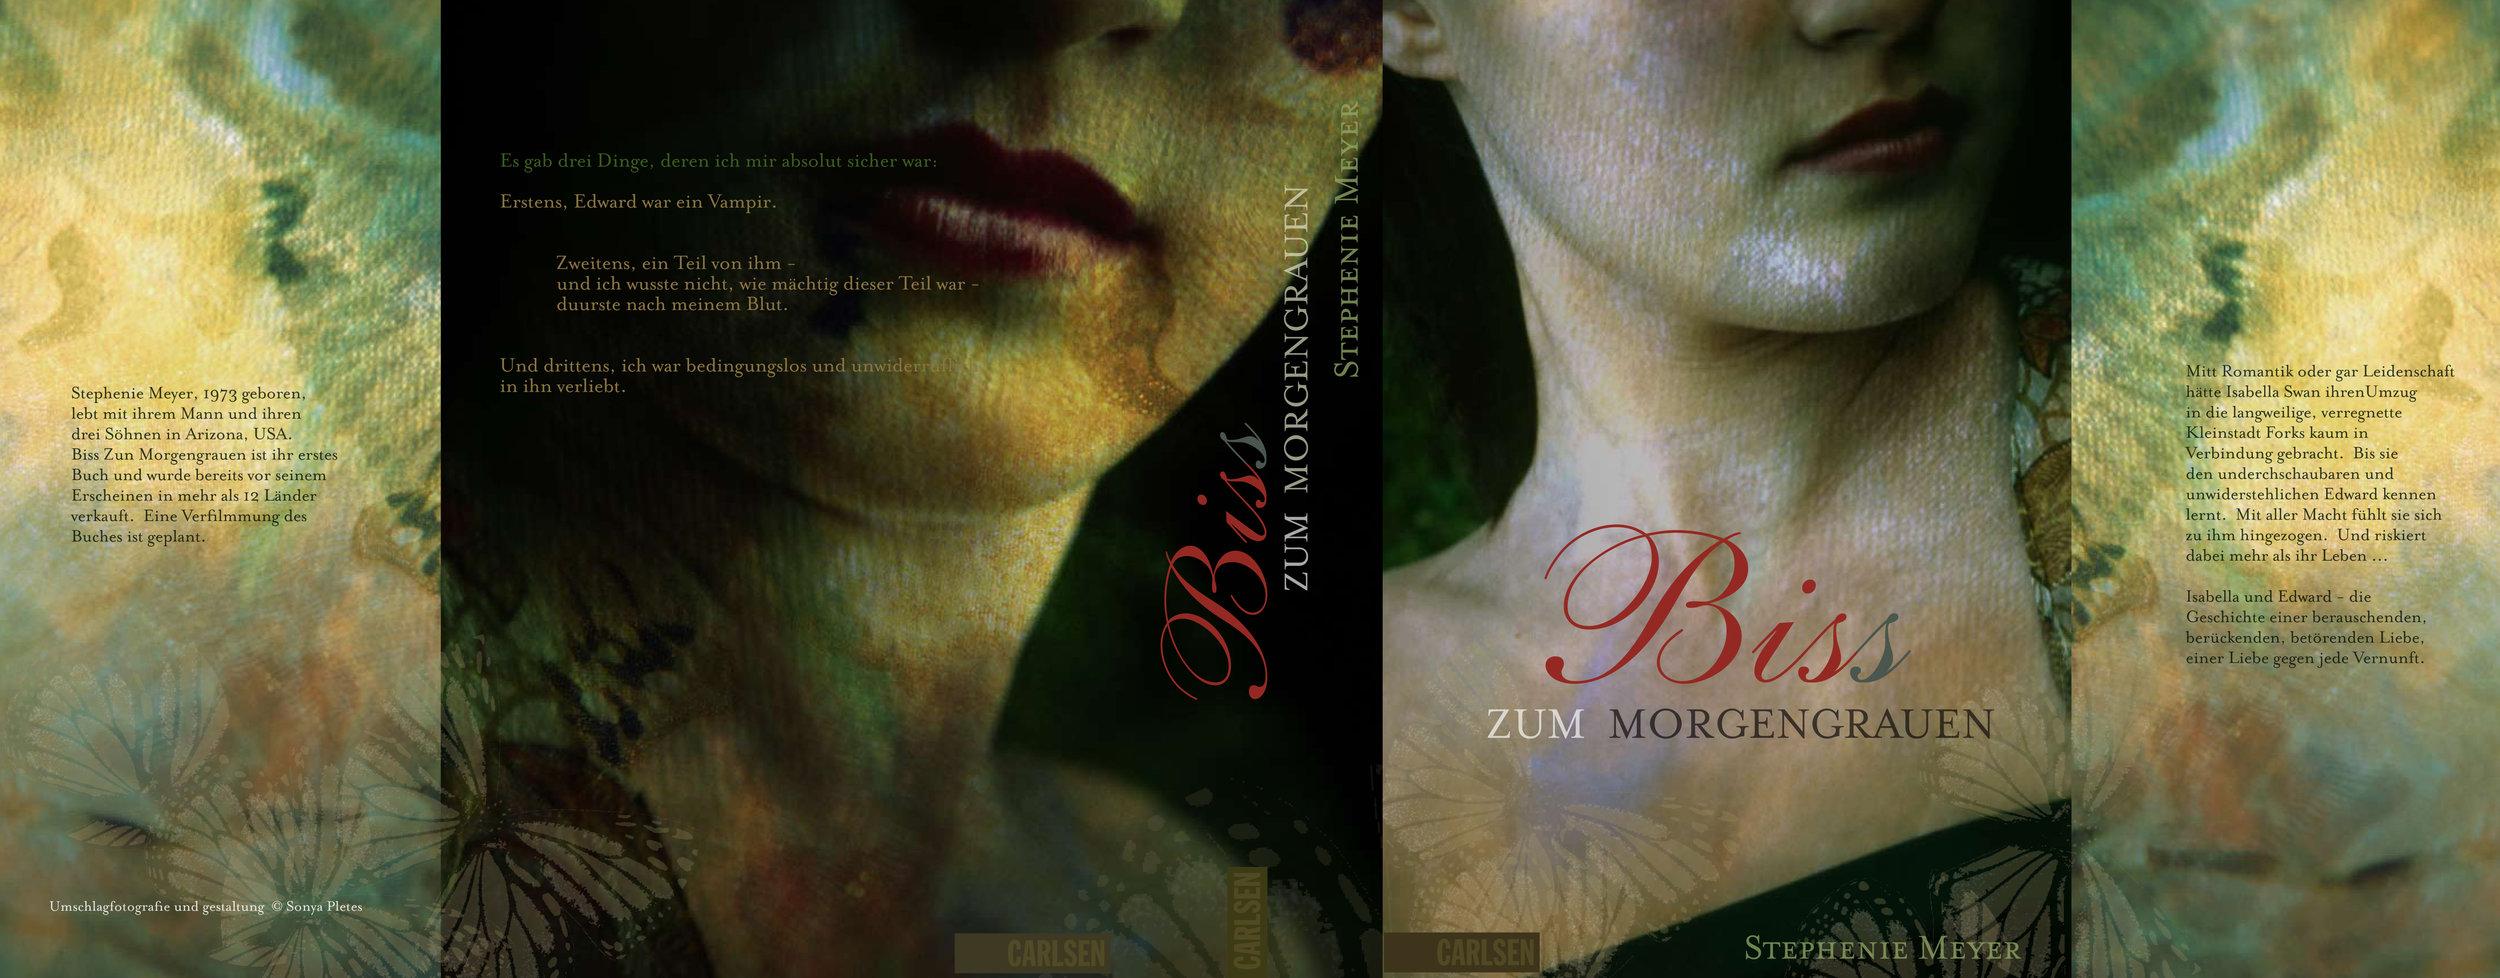 'Twilight'   by Stephenie Meyer. German Language Edition, Carlsen Verlag, Hamburg.  Design, Photography & Creative Direction © Sonya Pletes